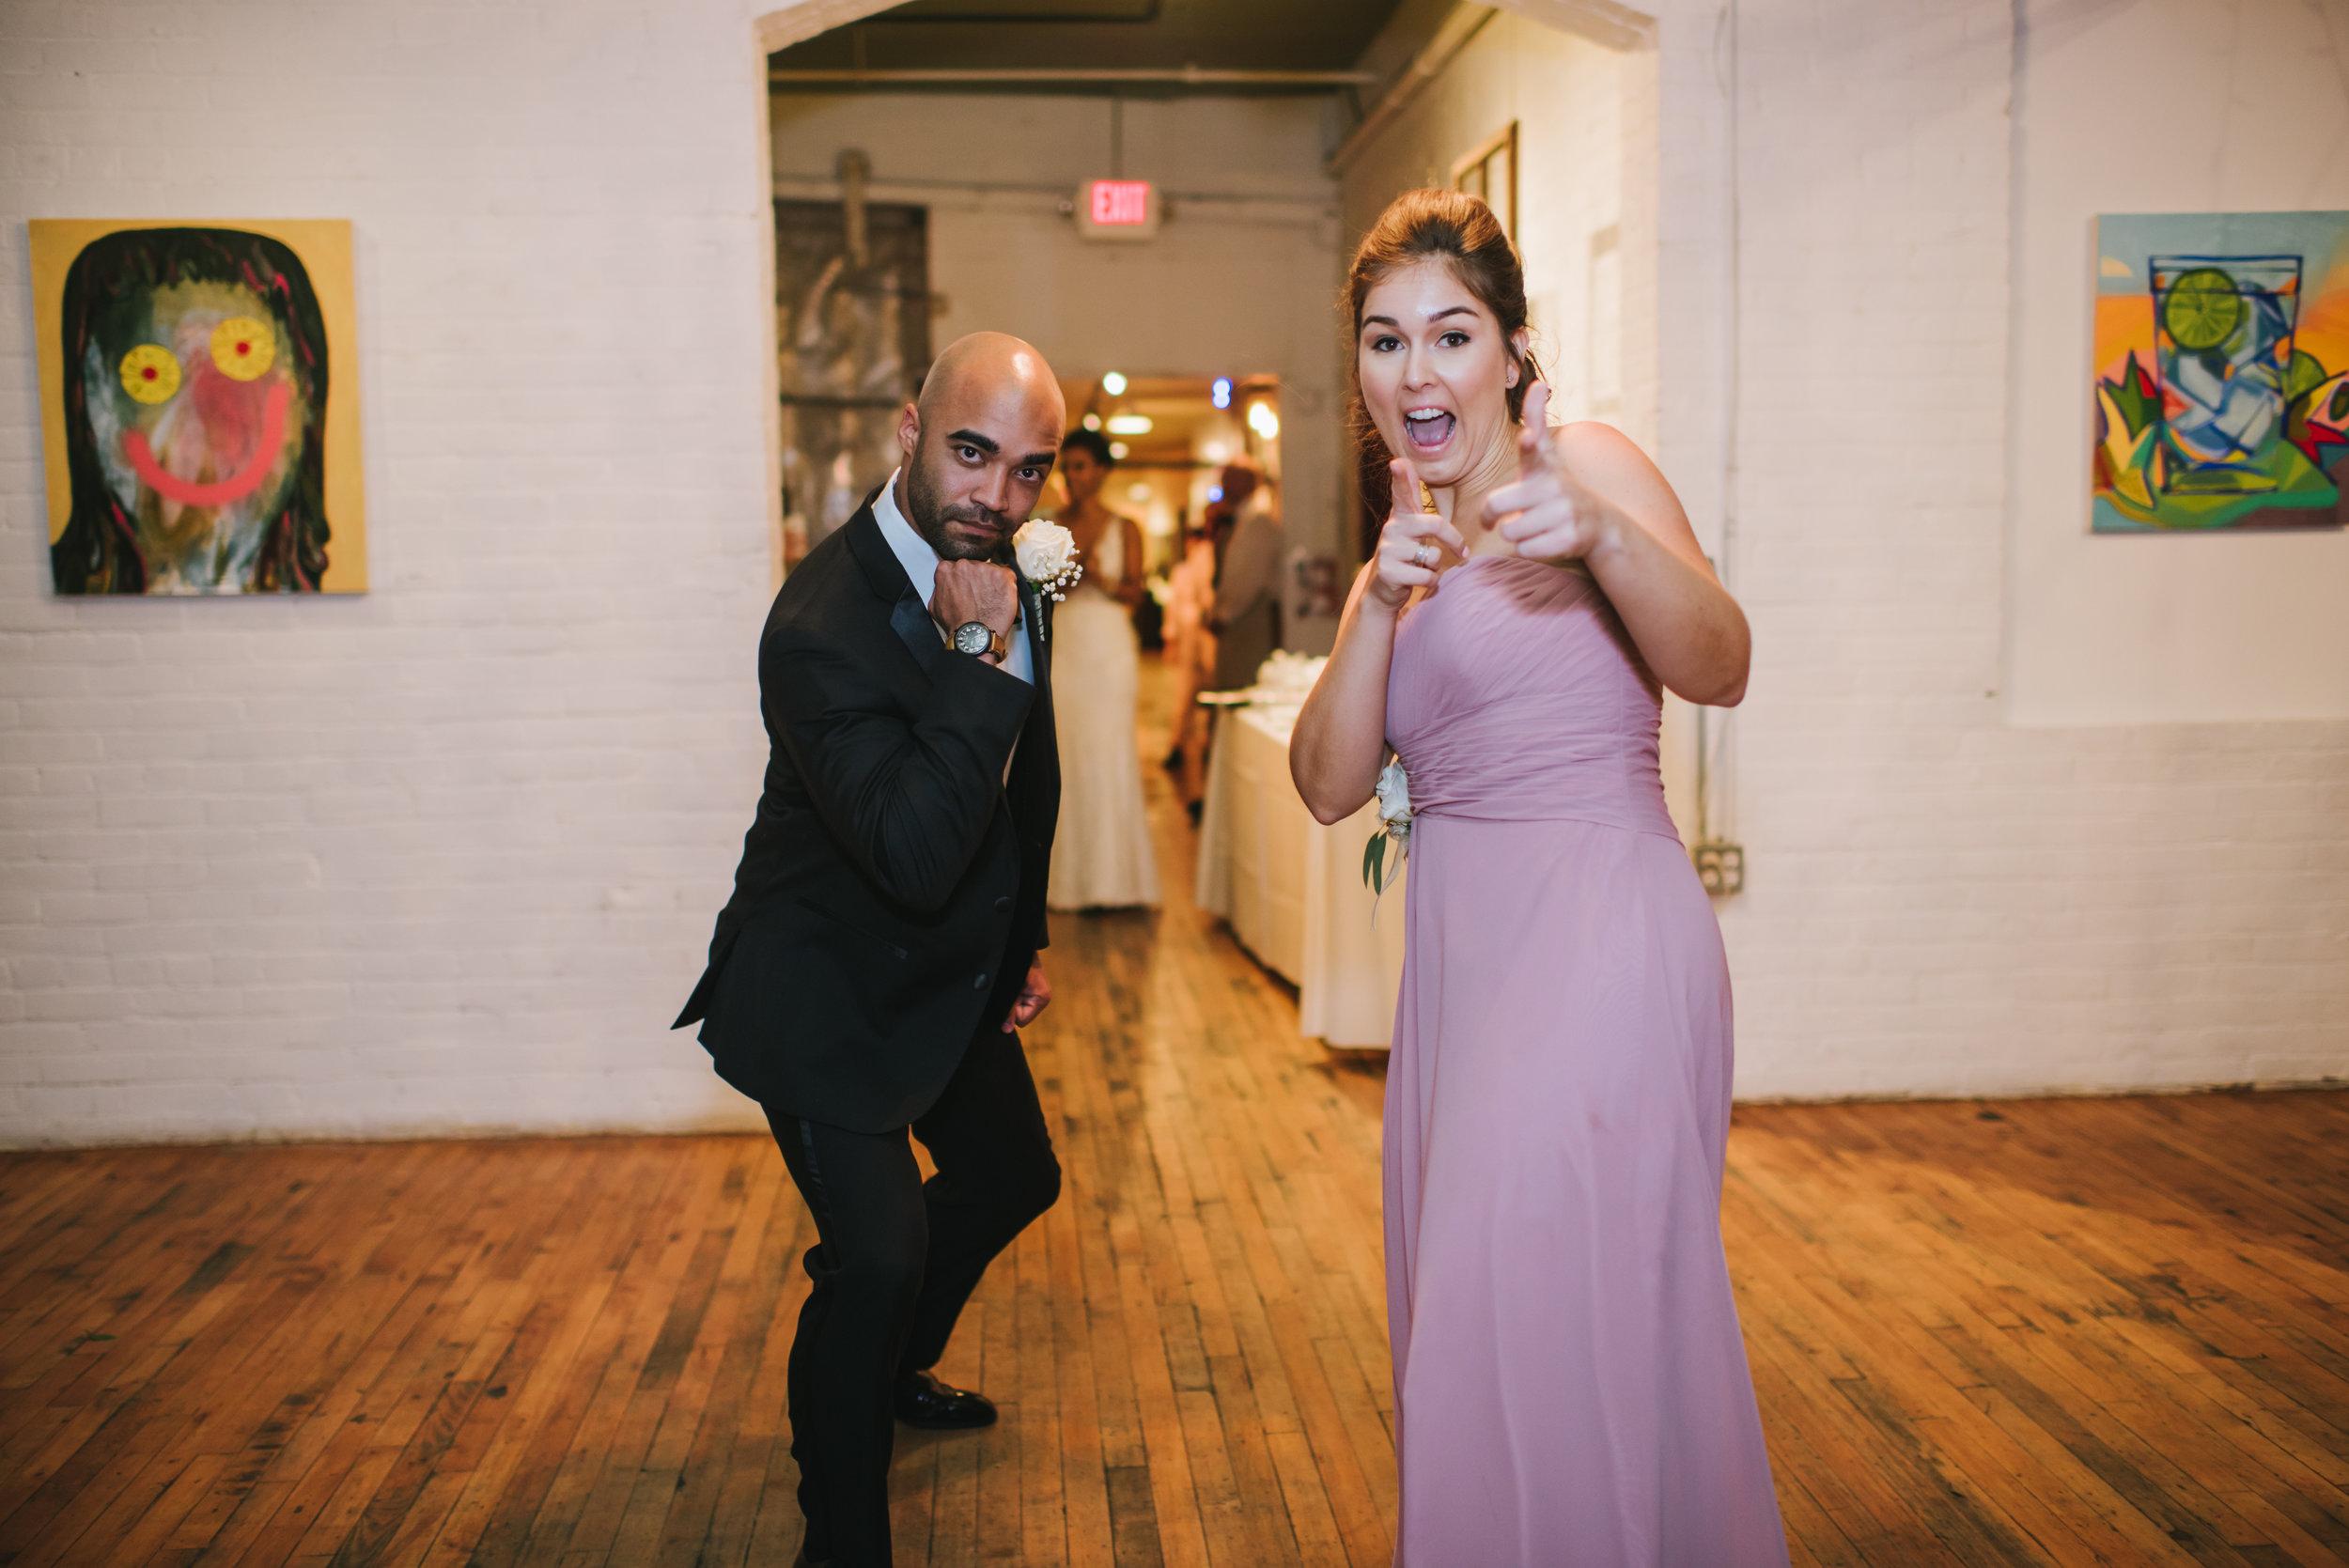 DANIELLE & BRANDON WEDDING - HEDGE ART GALLERY - NYC INTIMATE WEDDING PHOTOGRAPHER - CHI-CHI ARI-349.jpg